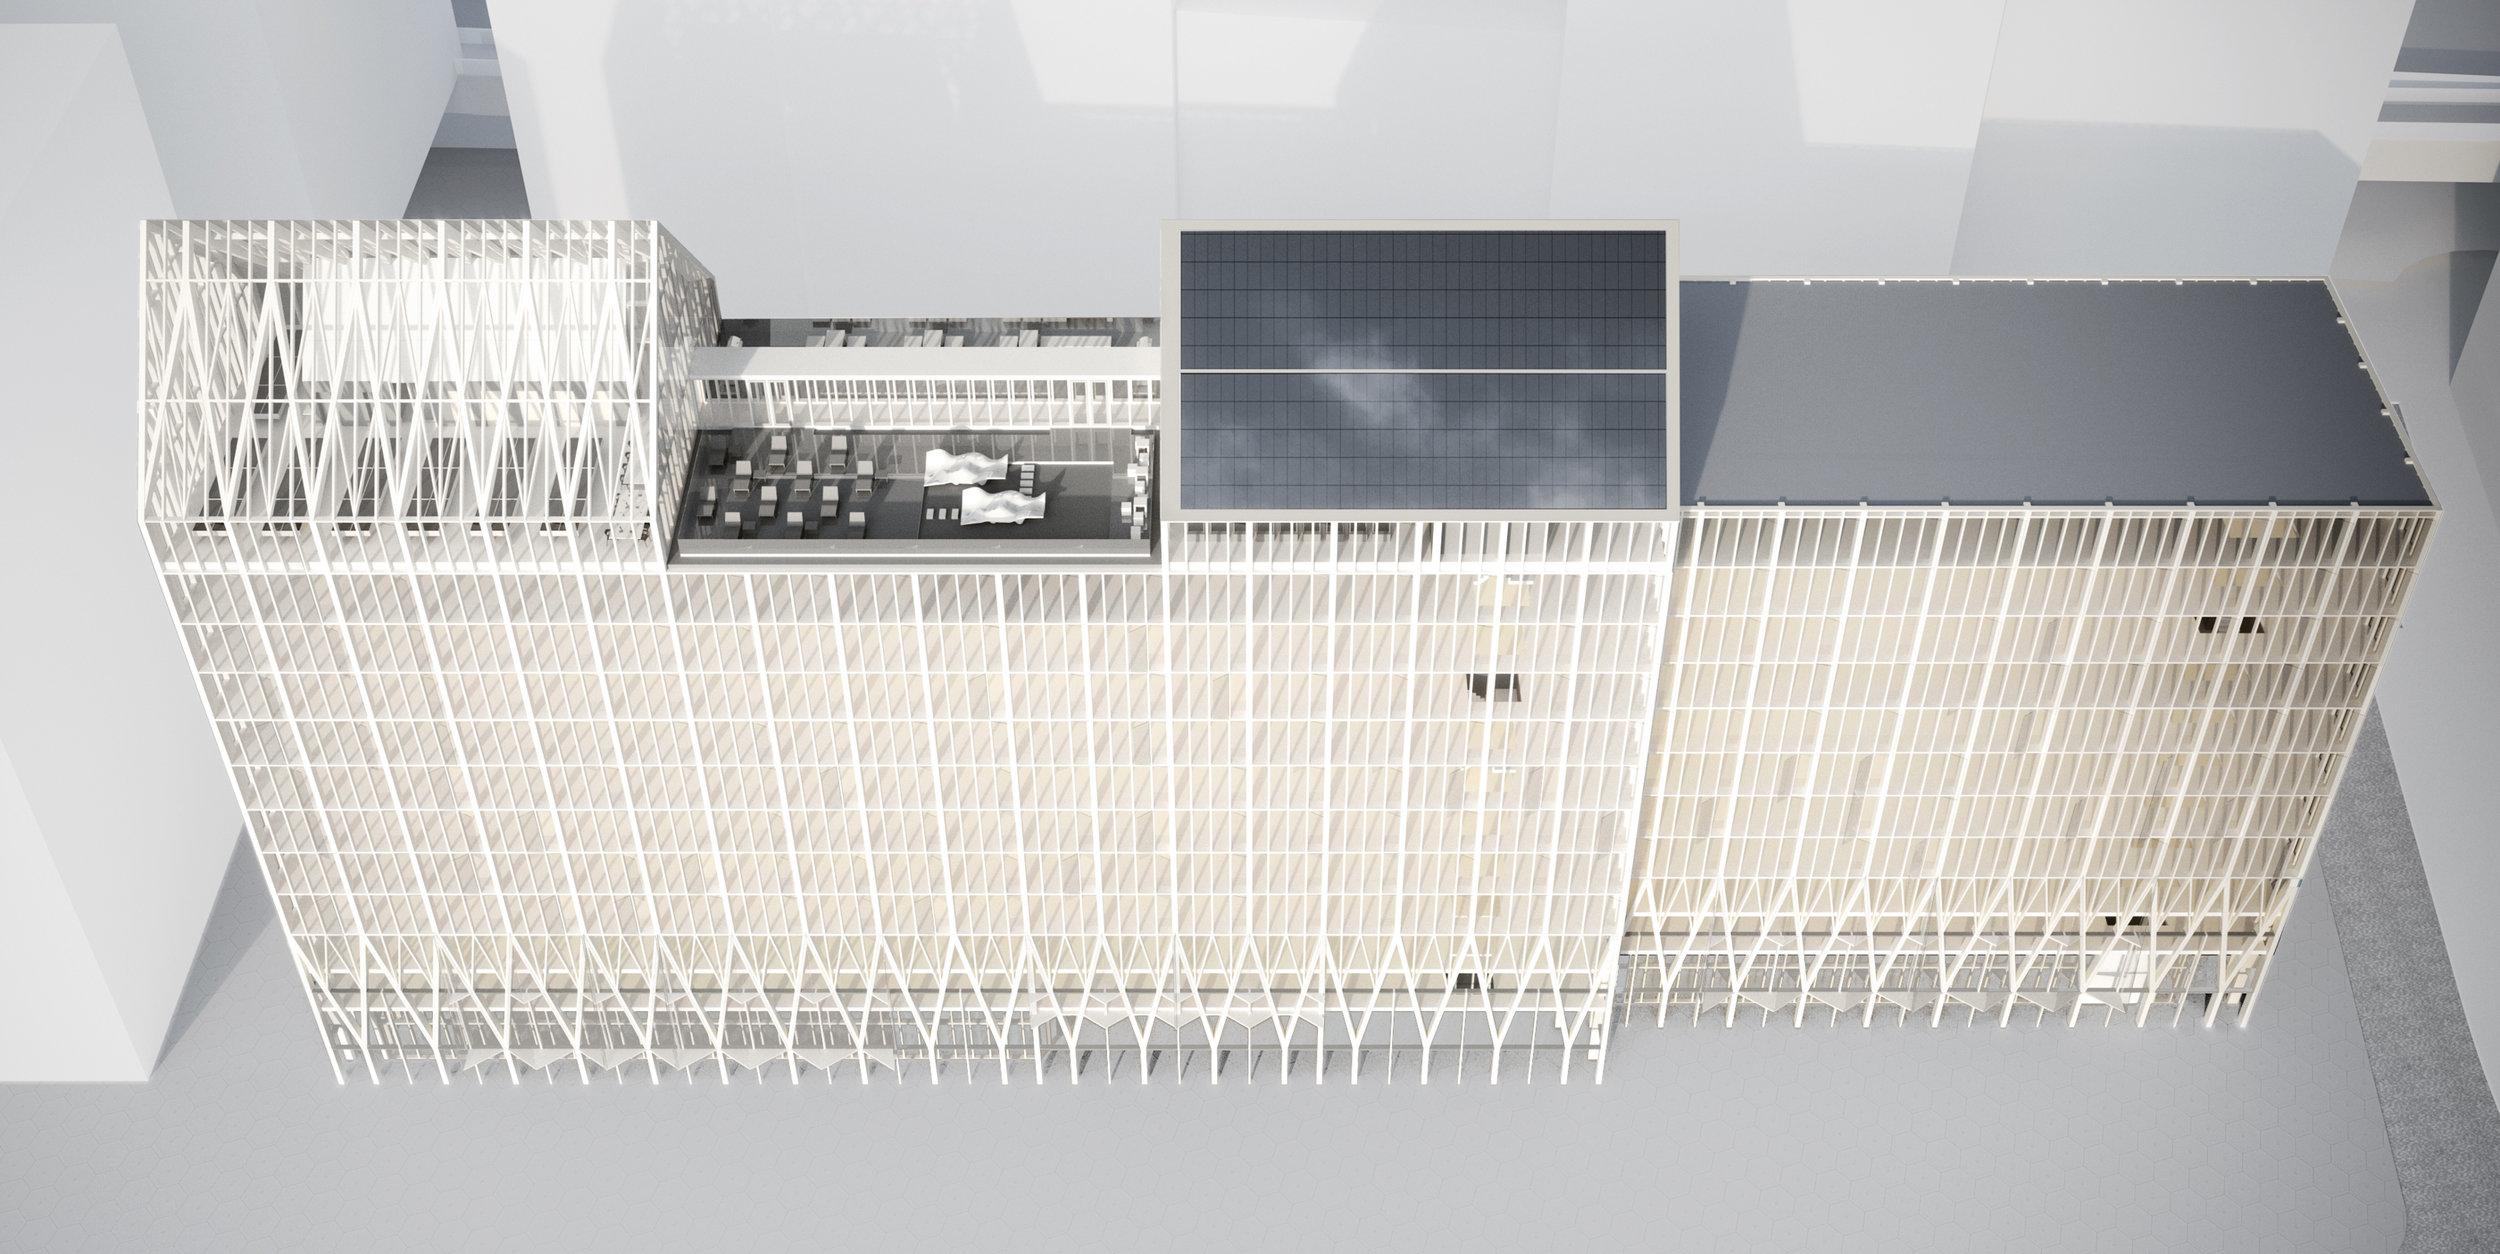 gh3 - SWL - Exterior - Building